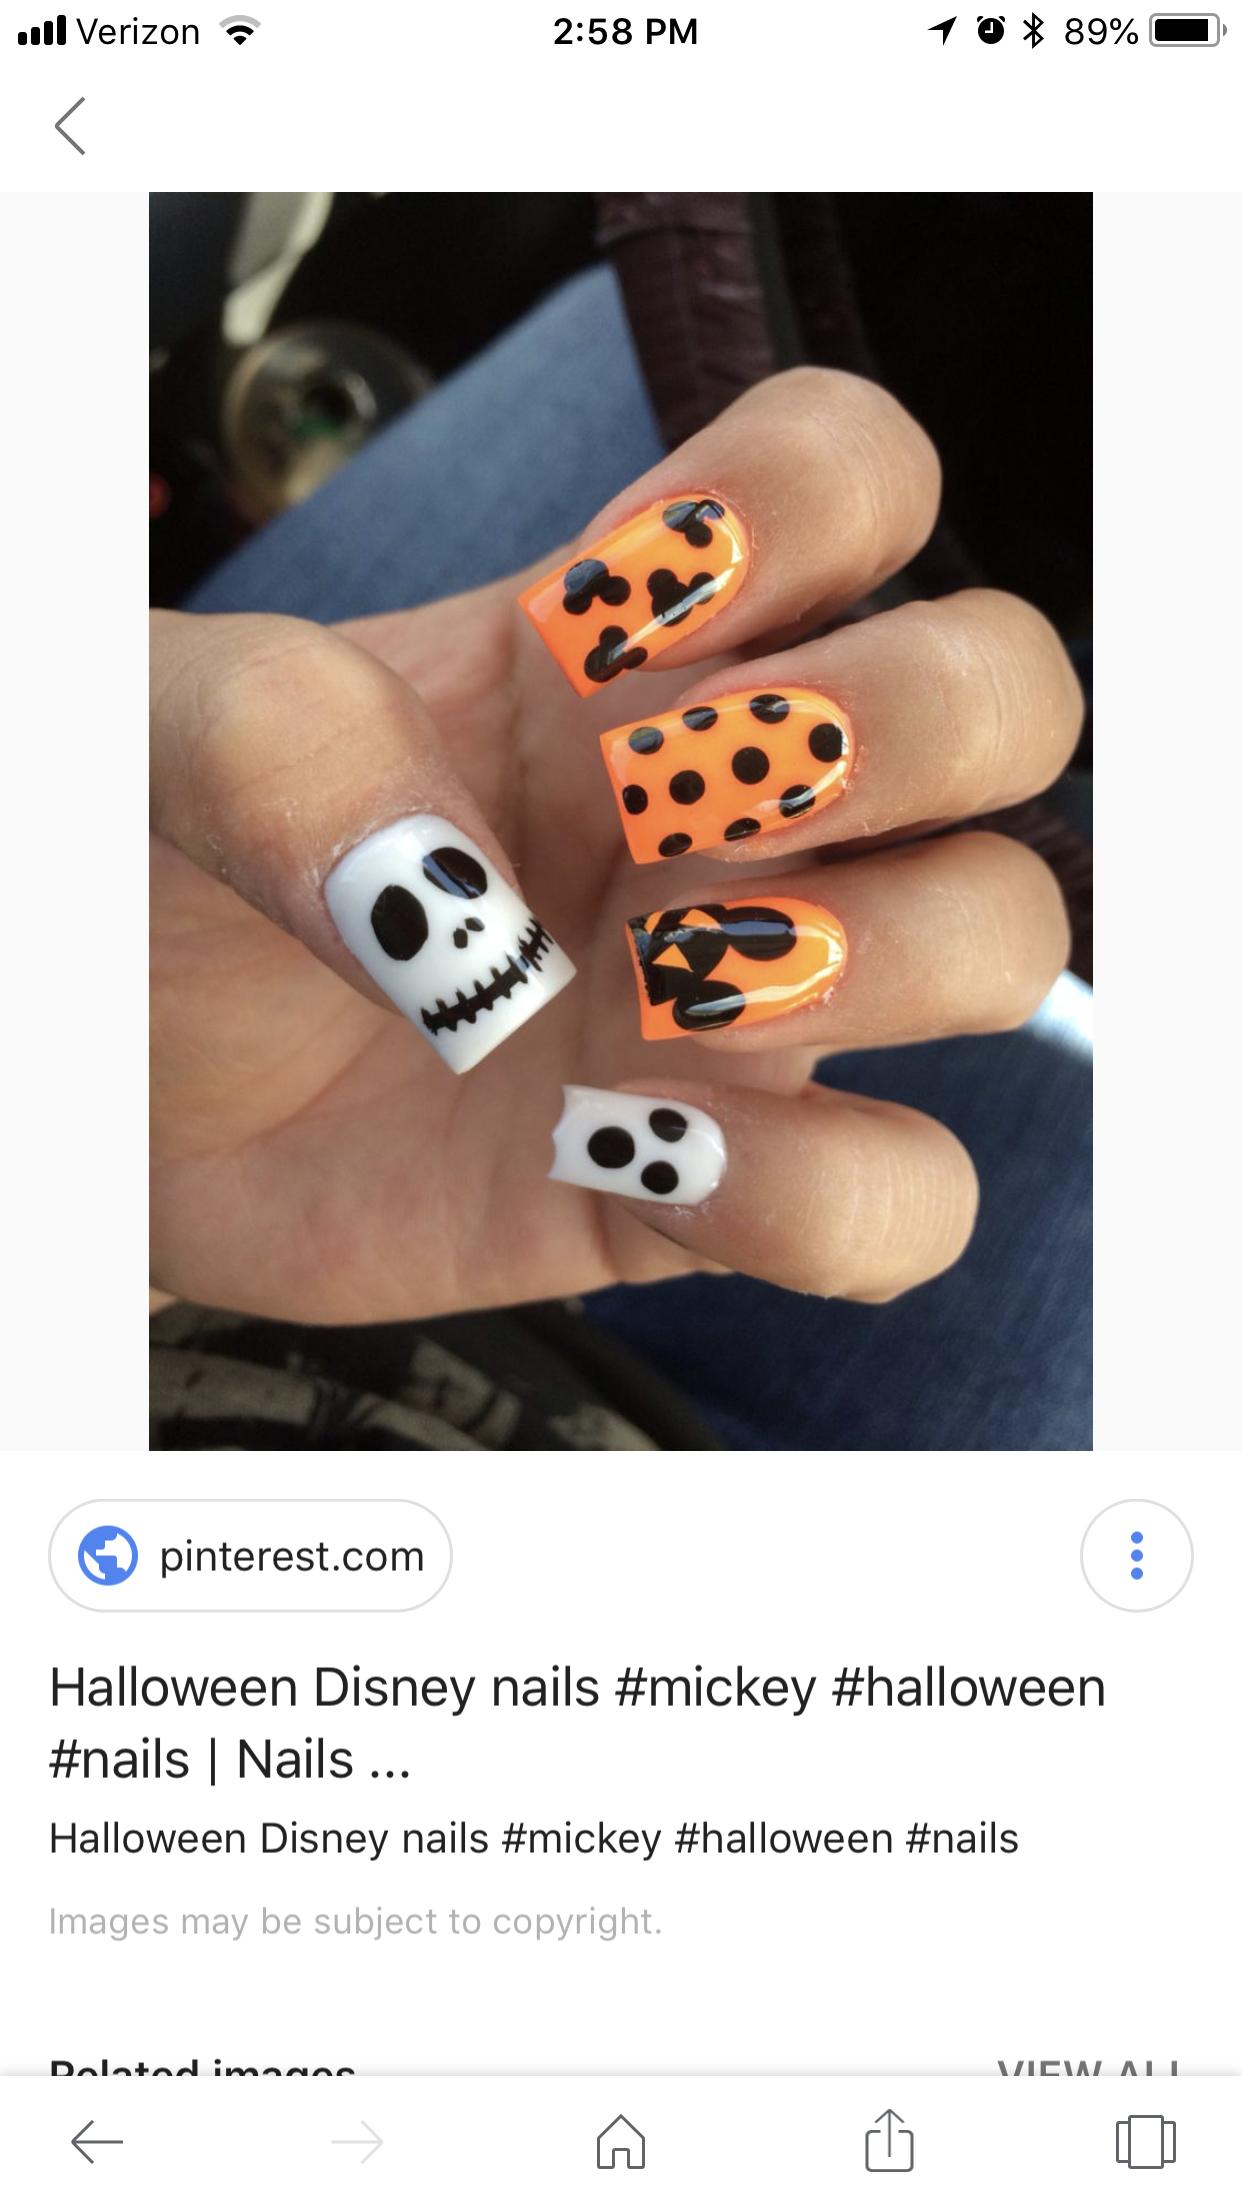 Disney Halloween Nails Disney Nails Disney Halloween Nails Disney World Nails